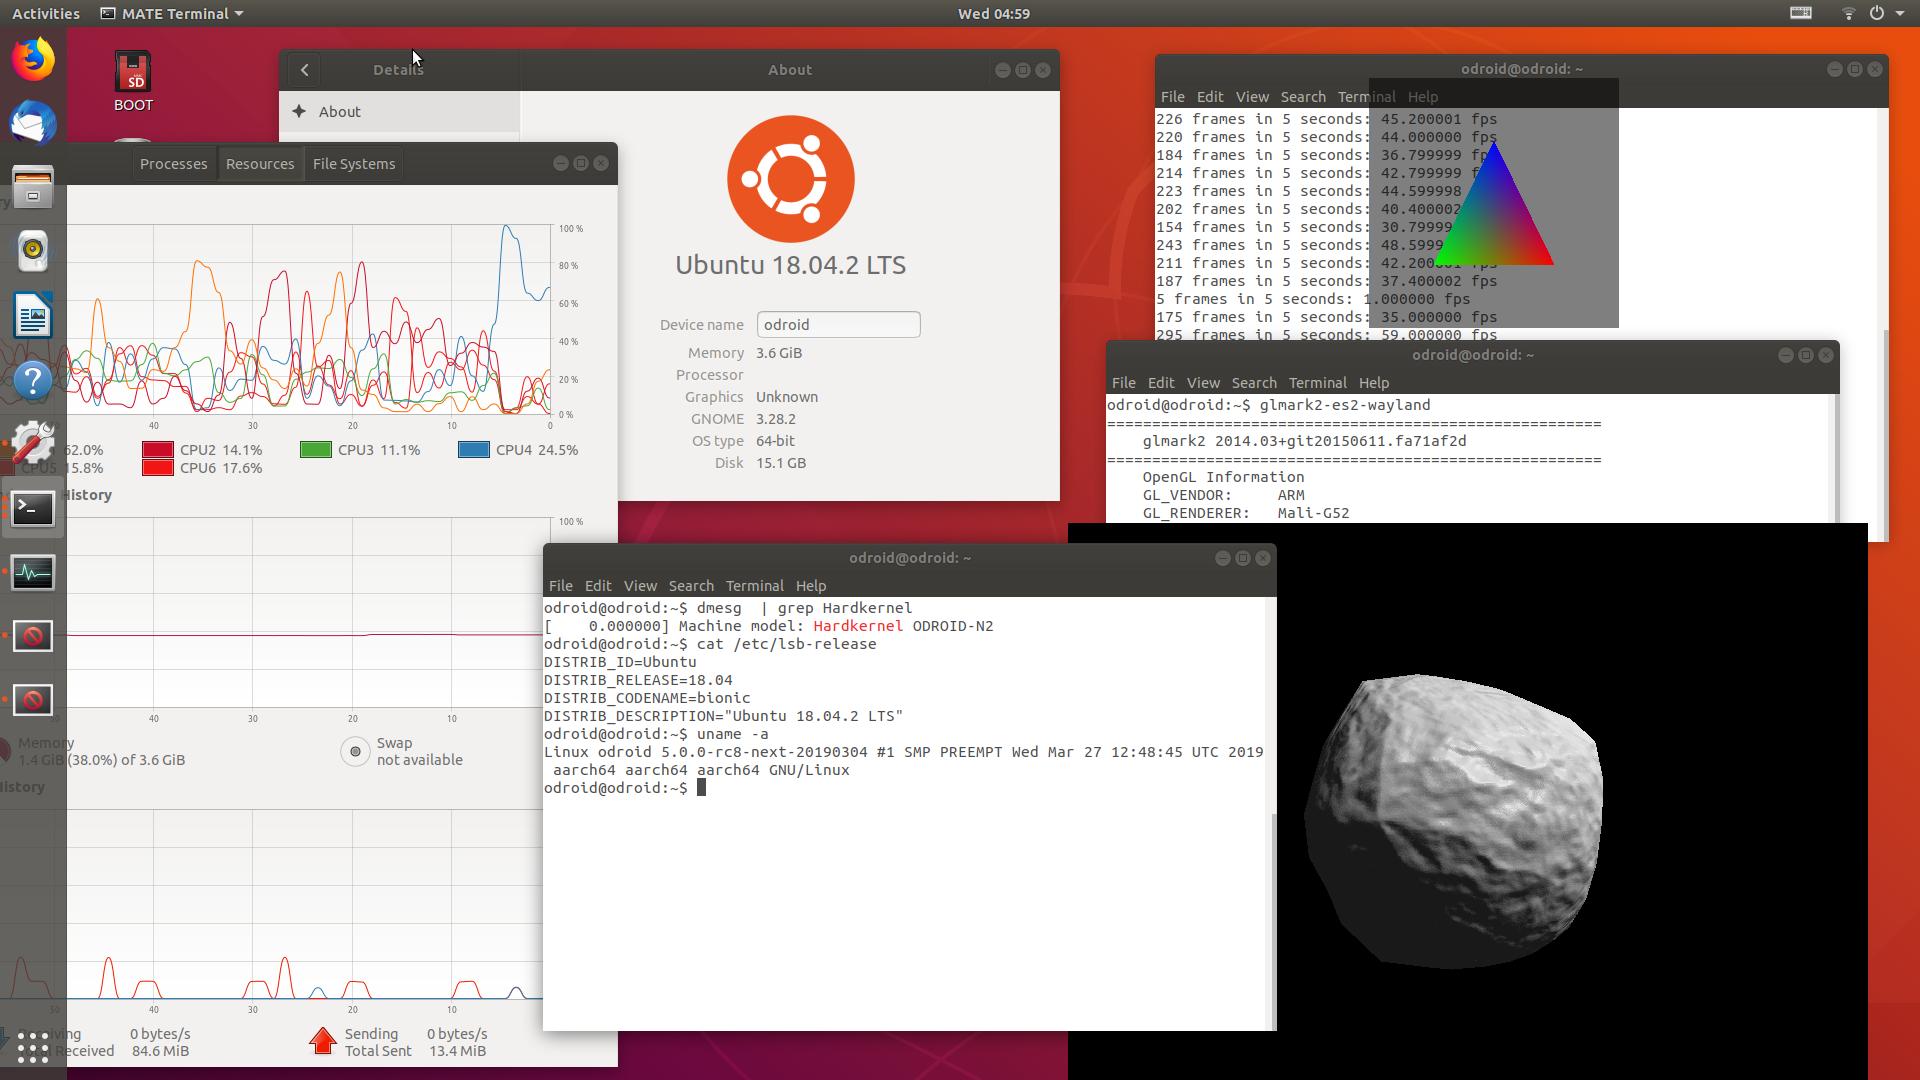 ODROID-N2 GPU Drivers, Linux 5 0, and Impressive glmarks-es2 Score